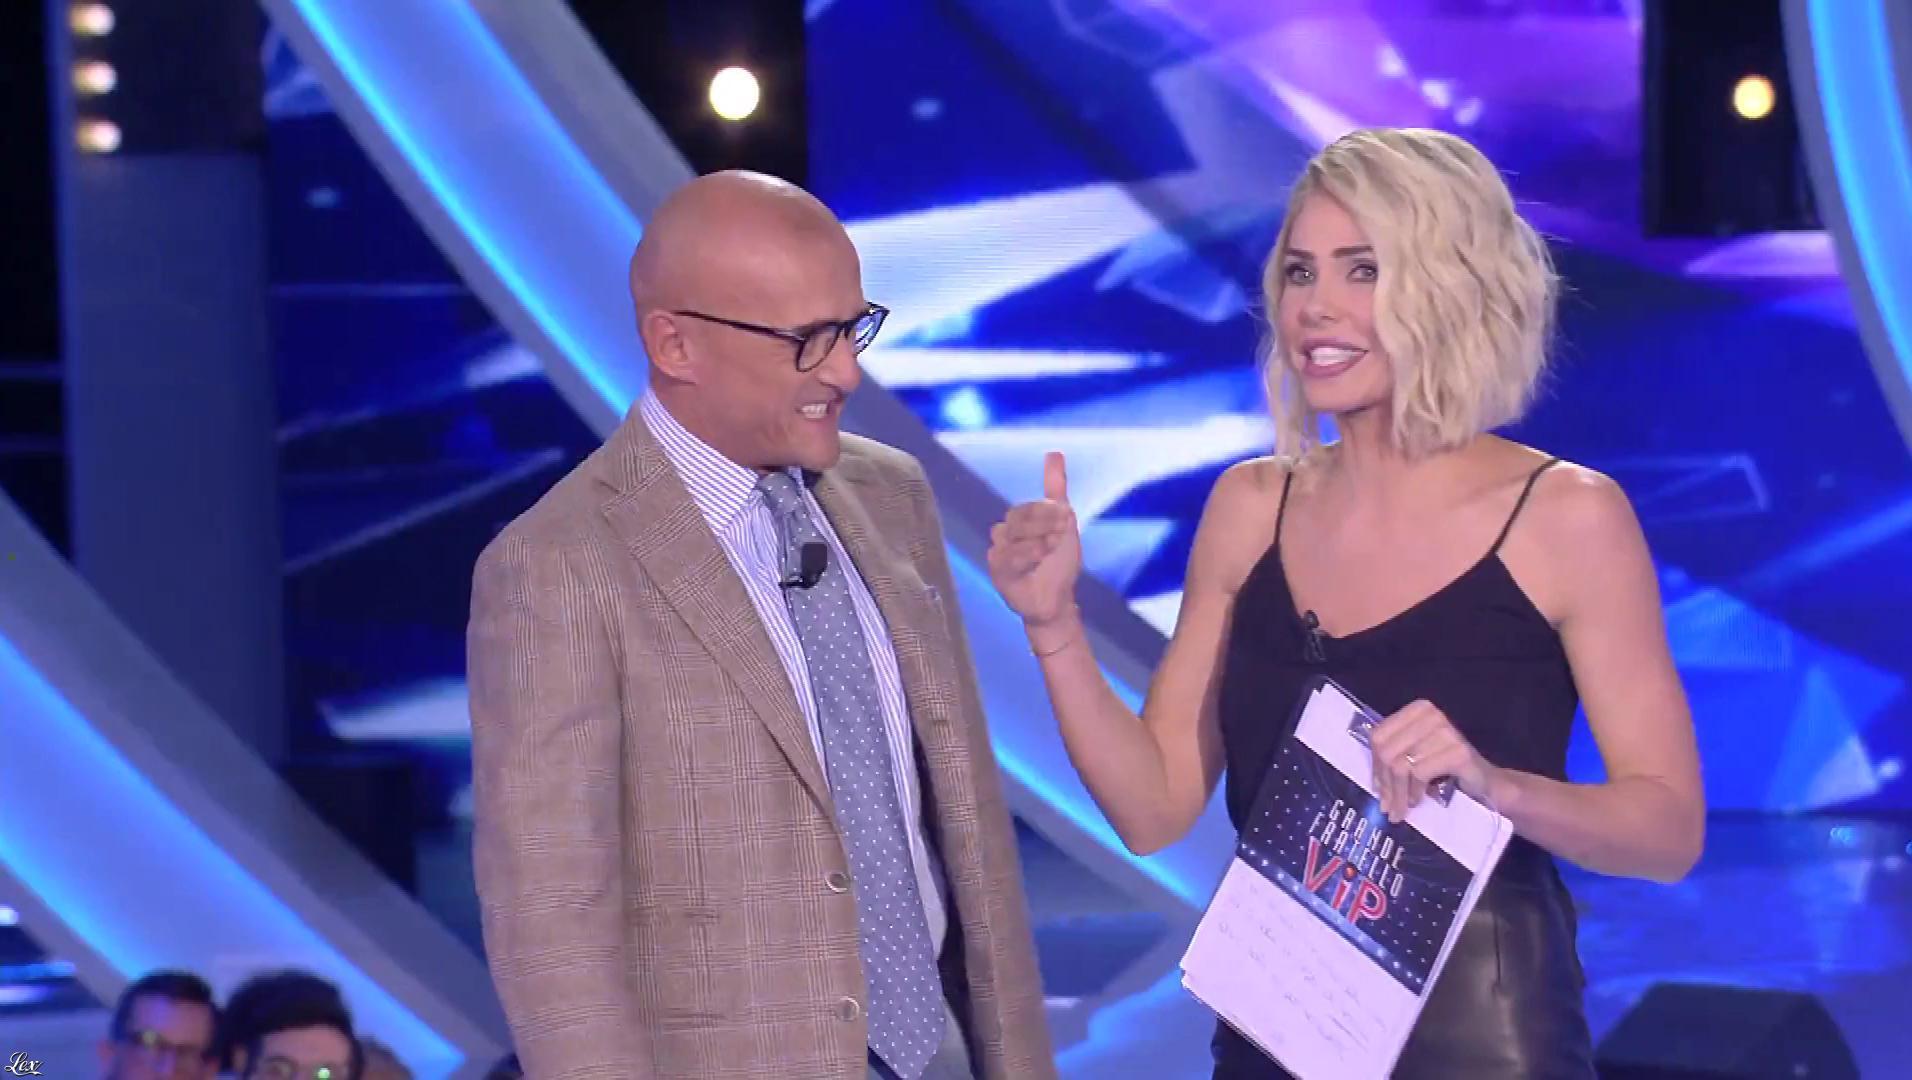 Ilary Blasi dans Grande Fratello VIP. Diffusé à la télévision le 22/10/18.